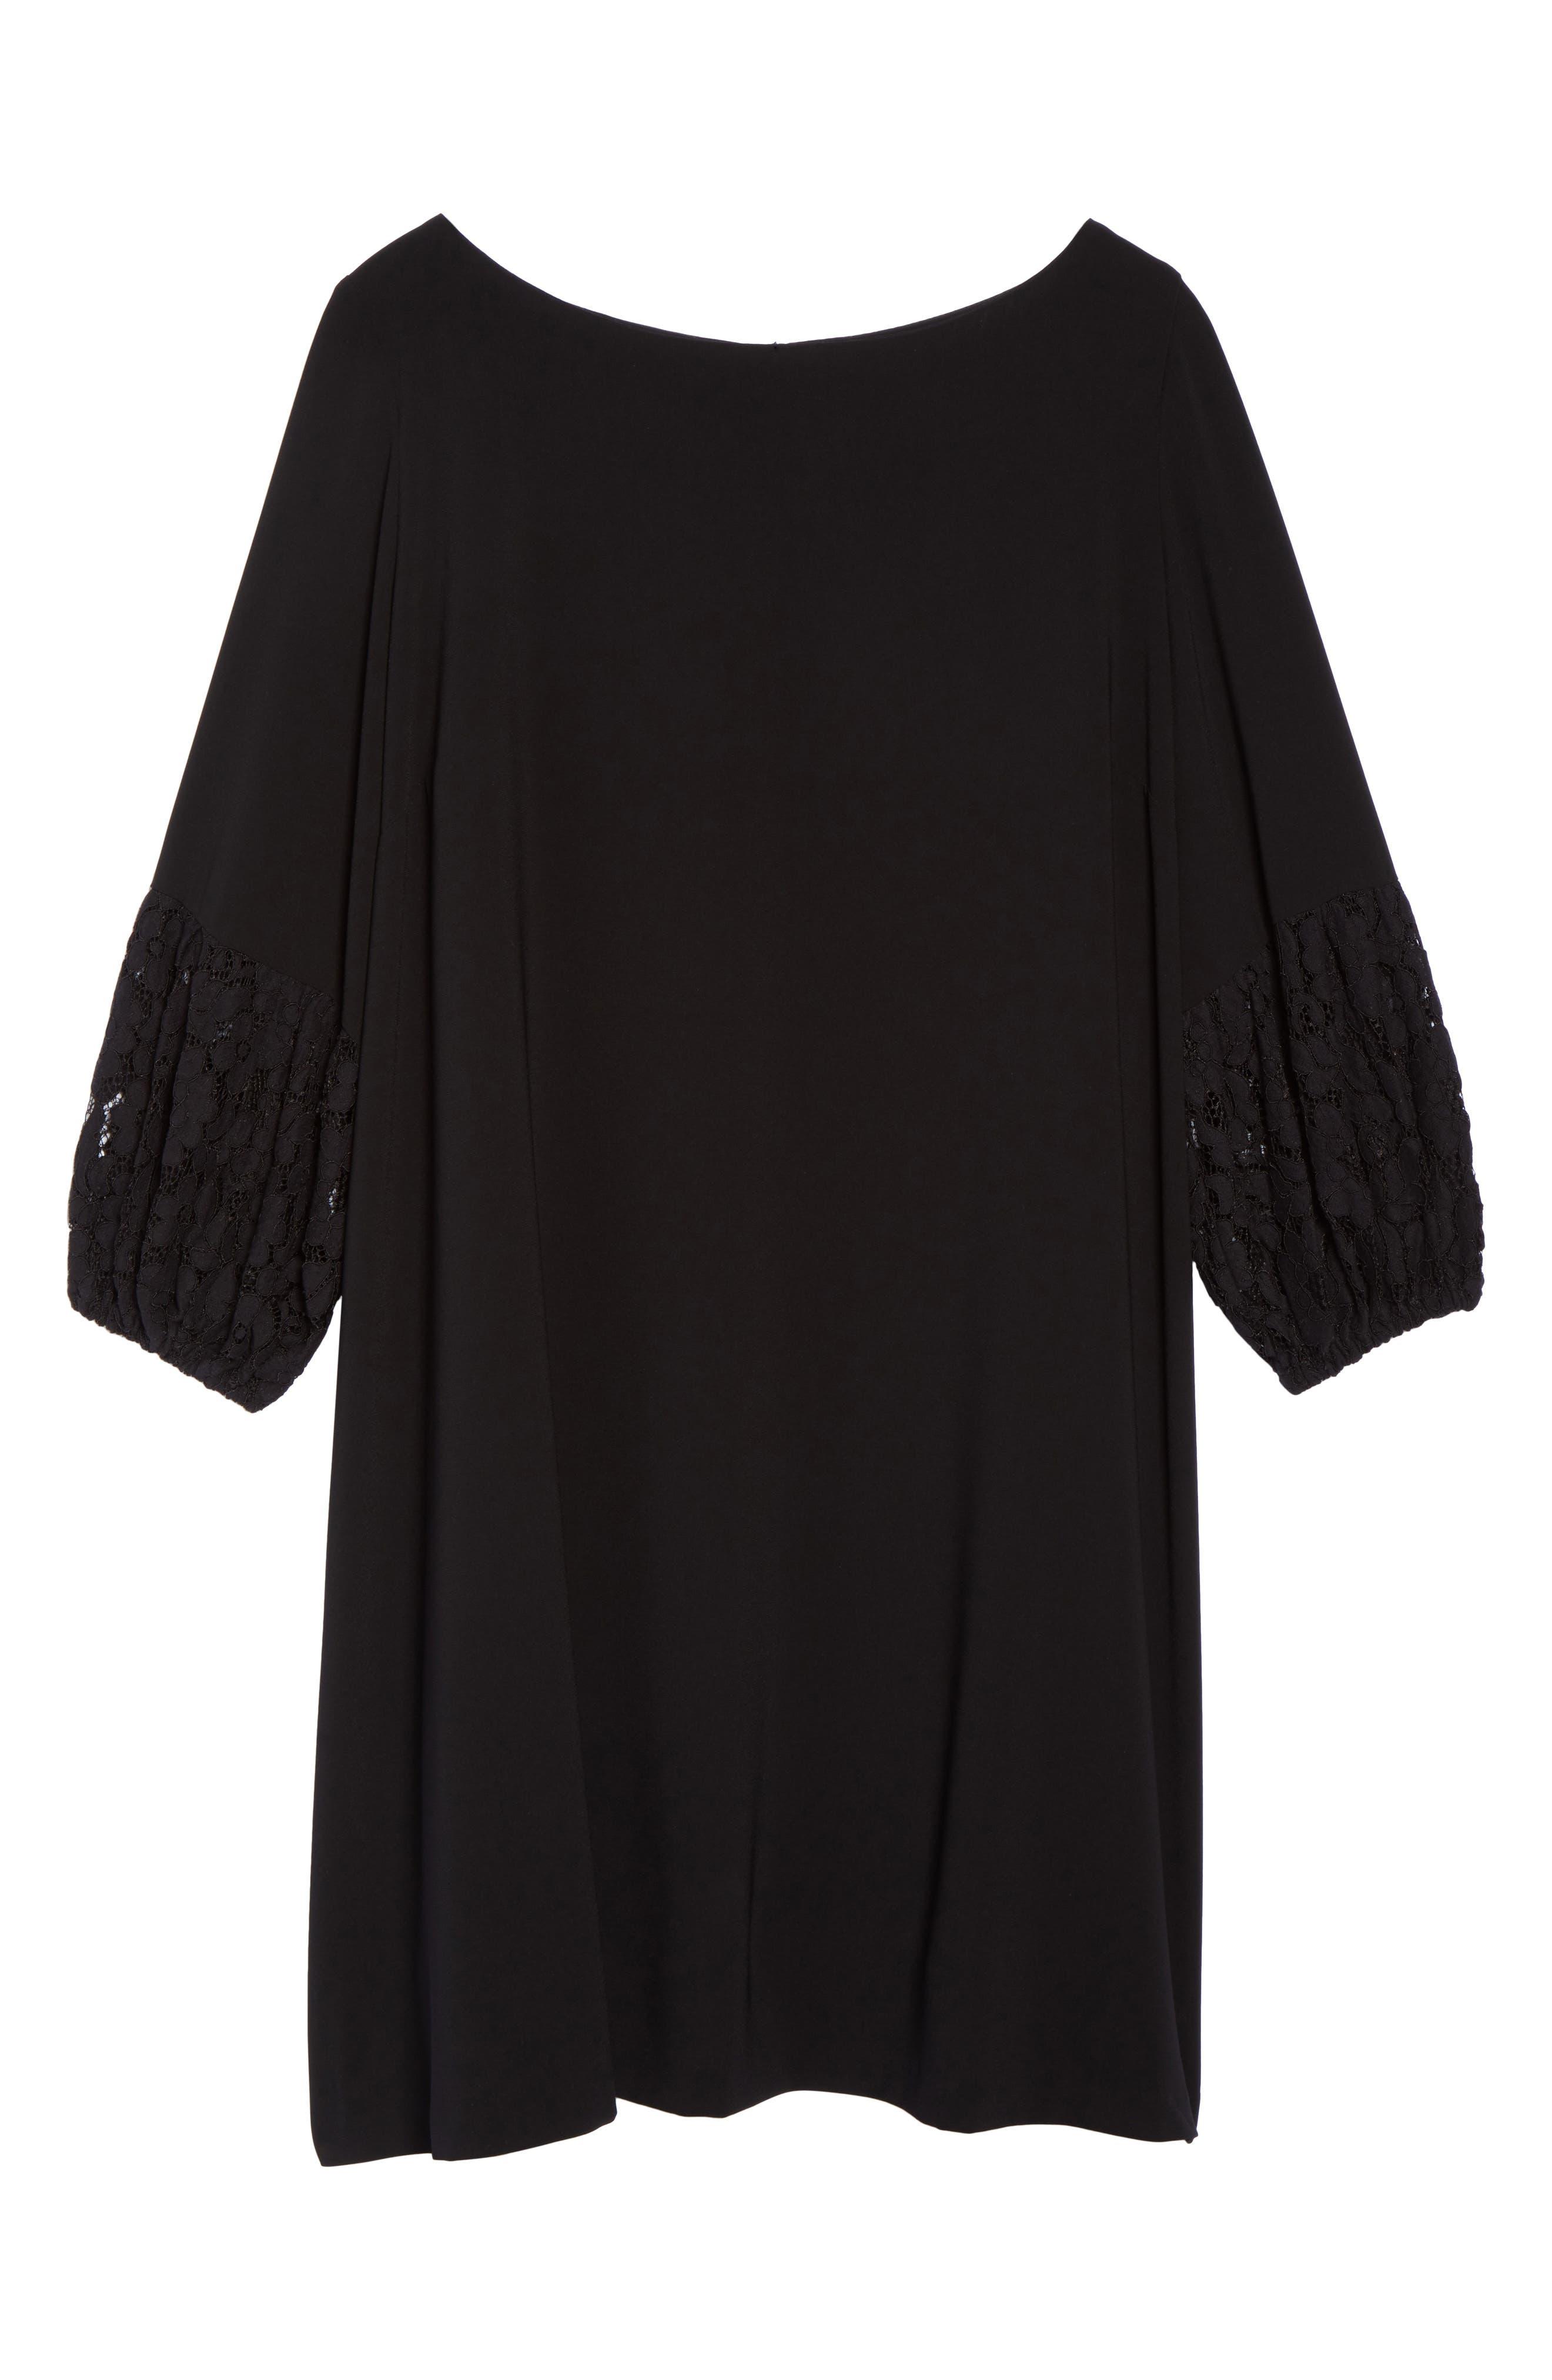 Lace Sleeve Trapeze Dress,                             Alternate thumbnail 6, color,                             Black